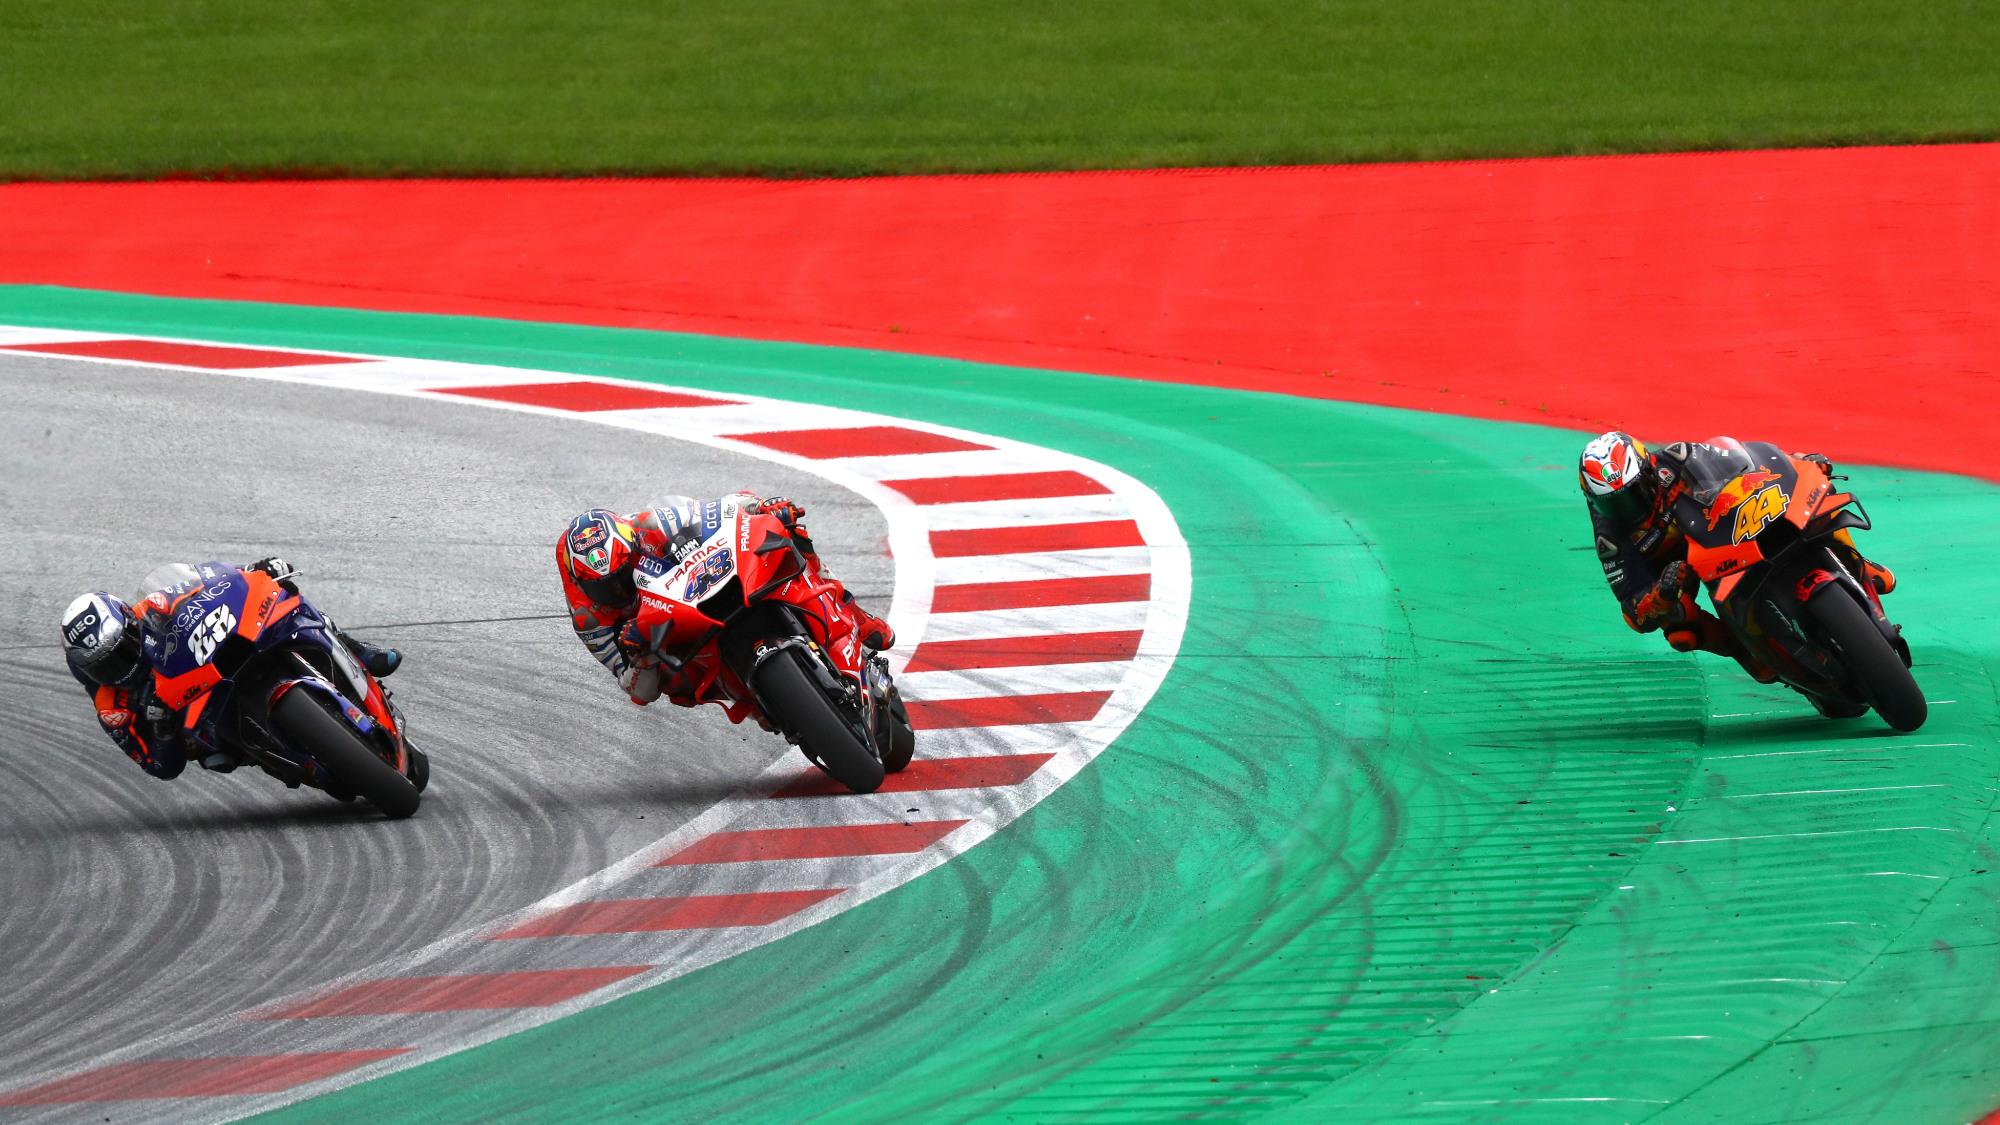 2020 Styrian GP MotoGP finish